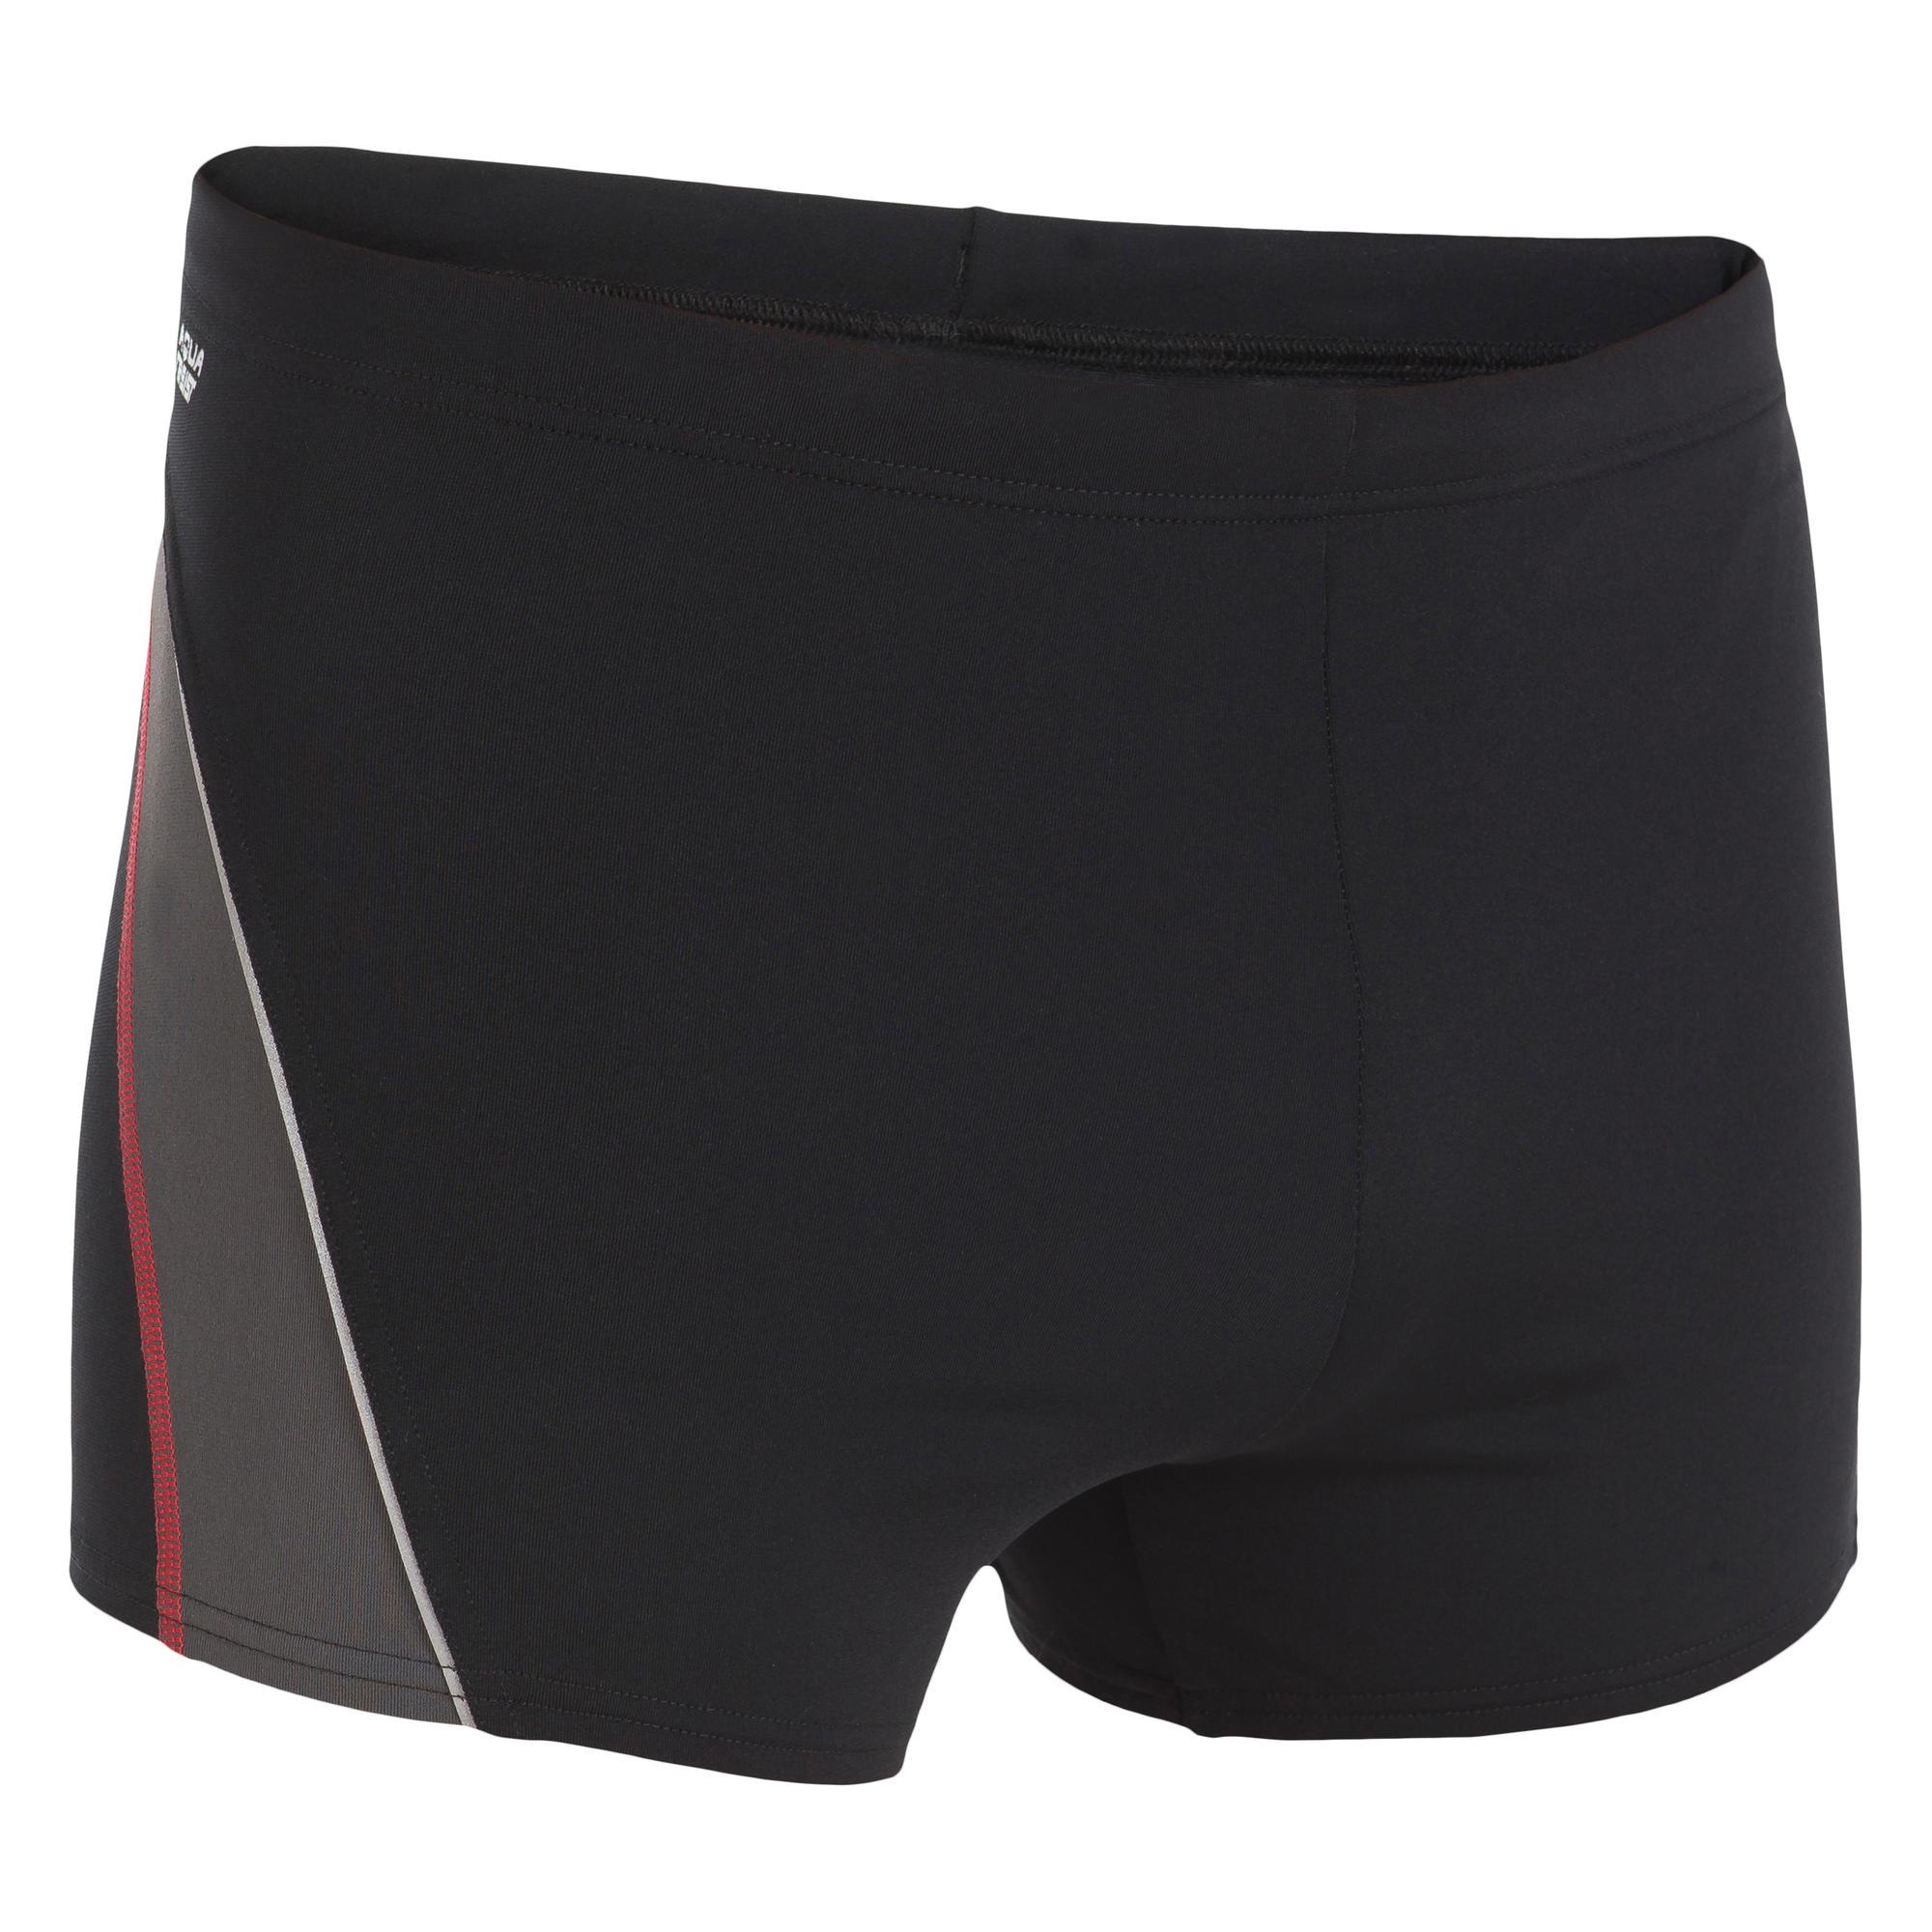 maillot de bain homme boxer 500 fit noir gris nabaiji. Black Bedroom Furniture Sets. Home Design Ideas